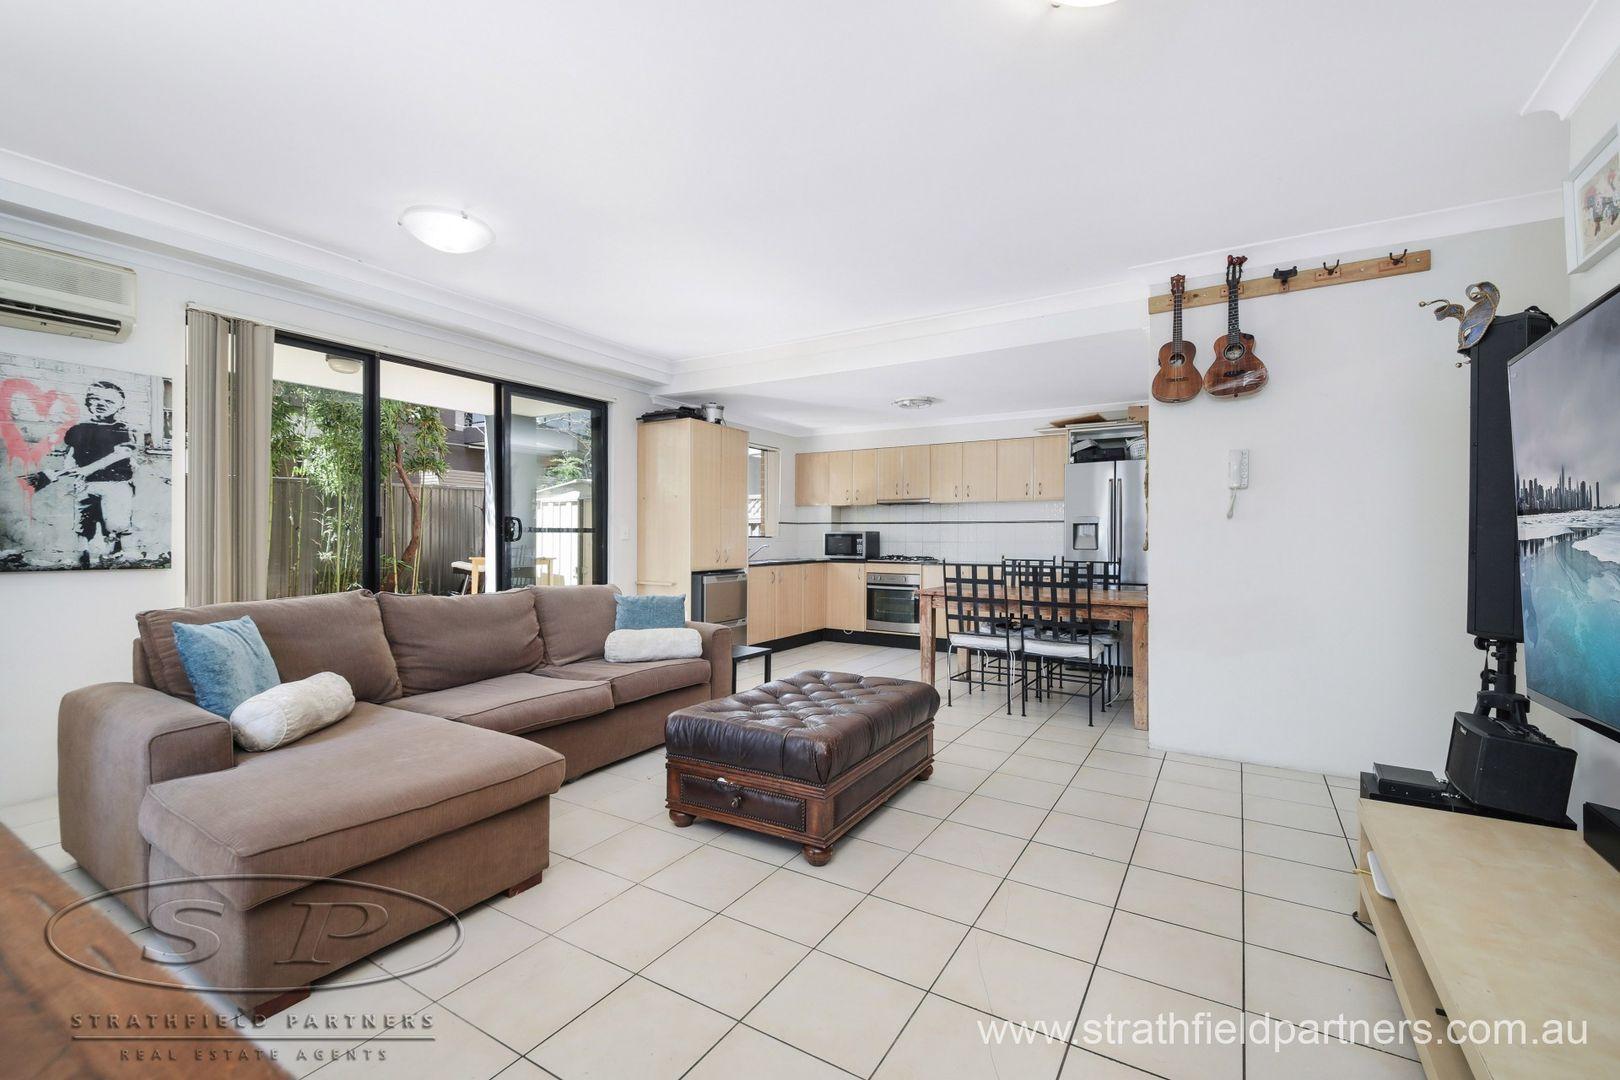 1/9 Anselm Street, Strathfield South NSW 2136, Image 0